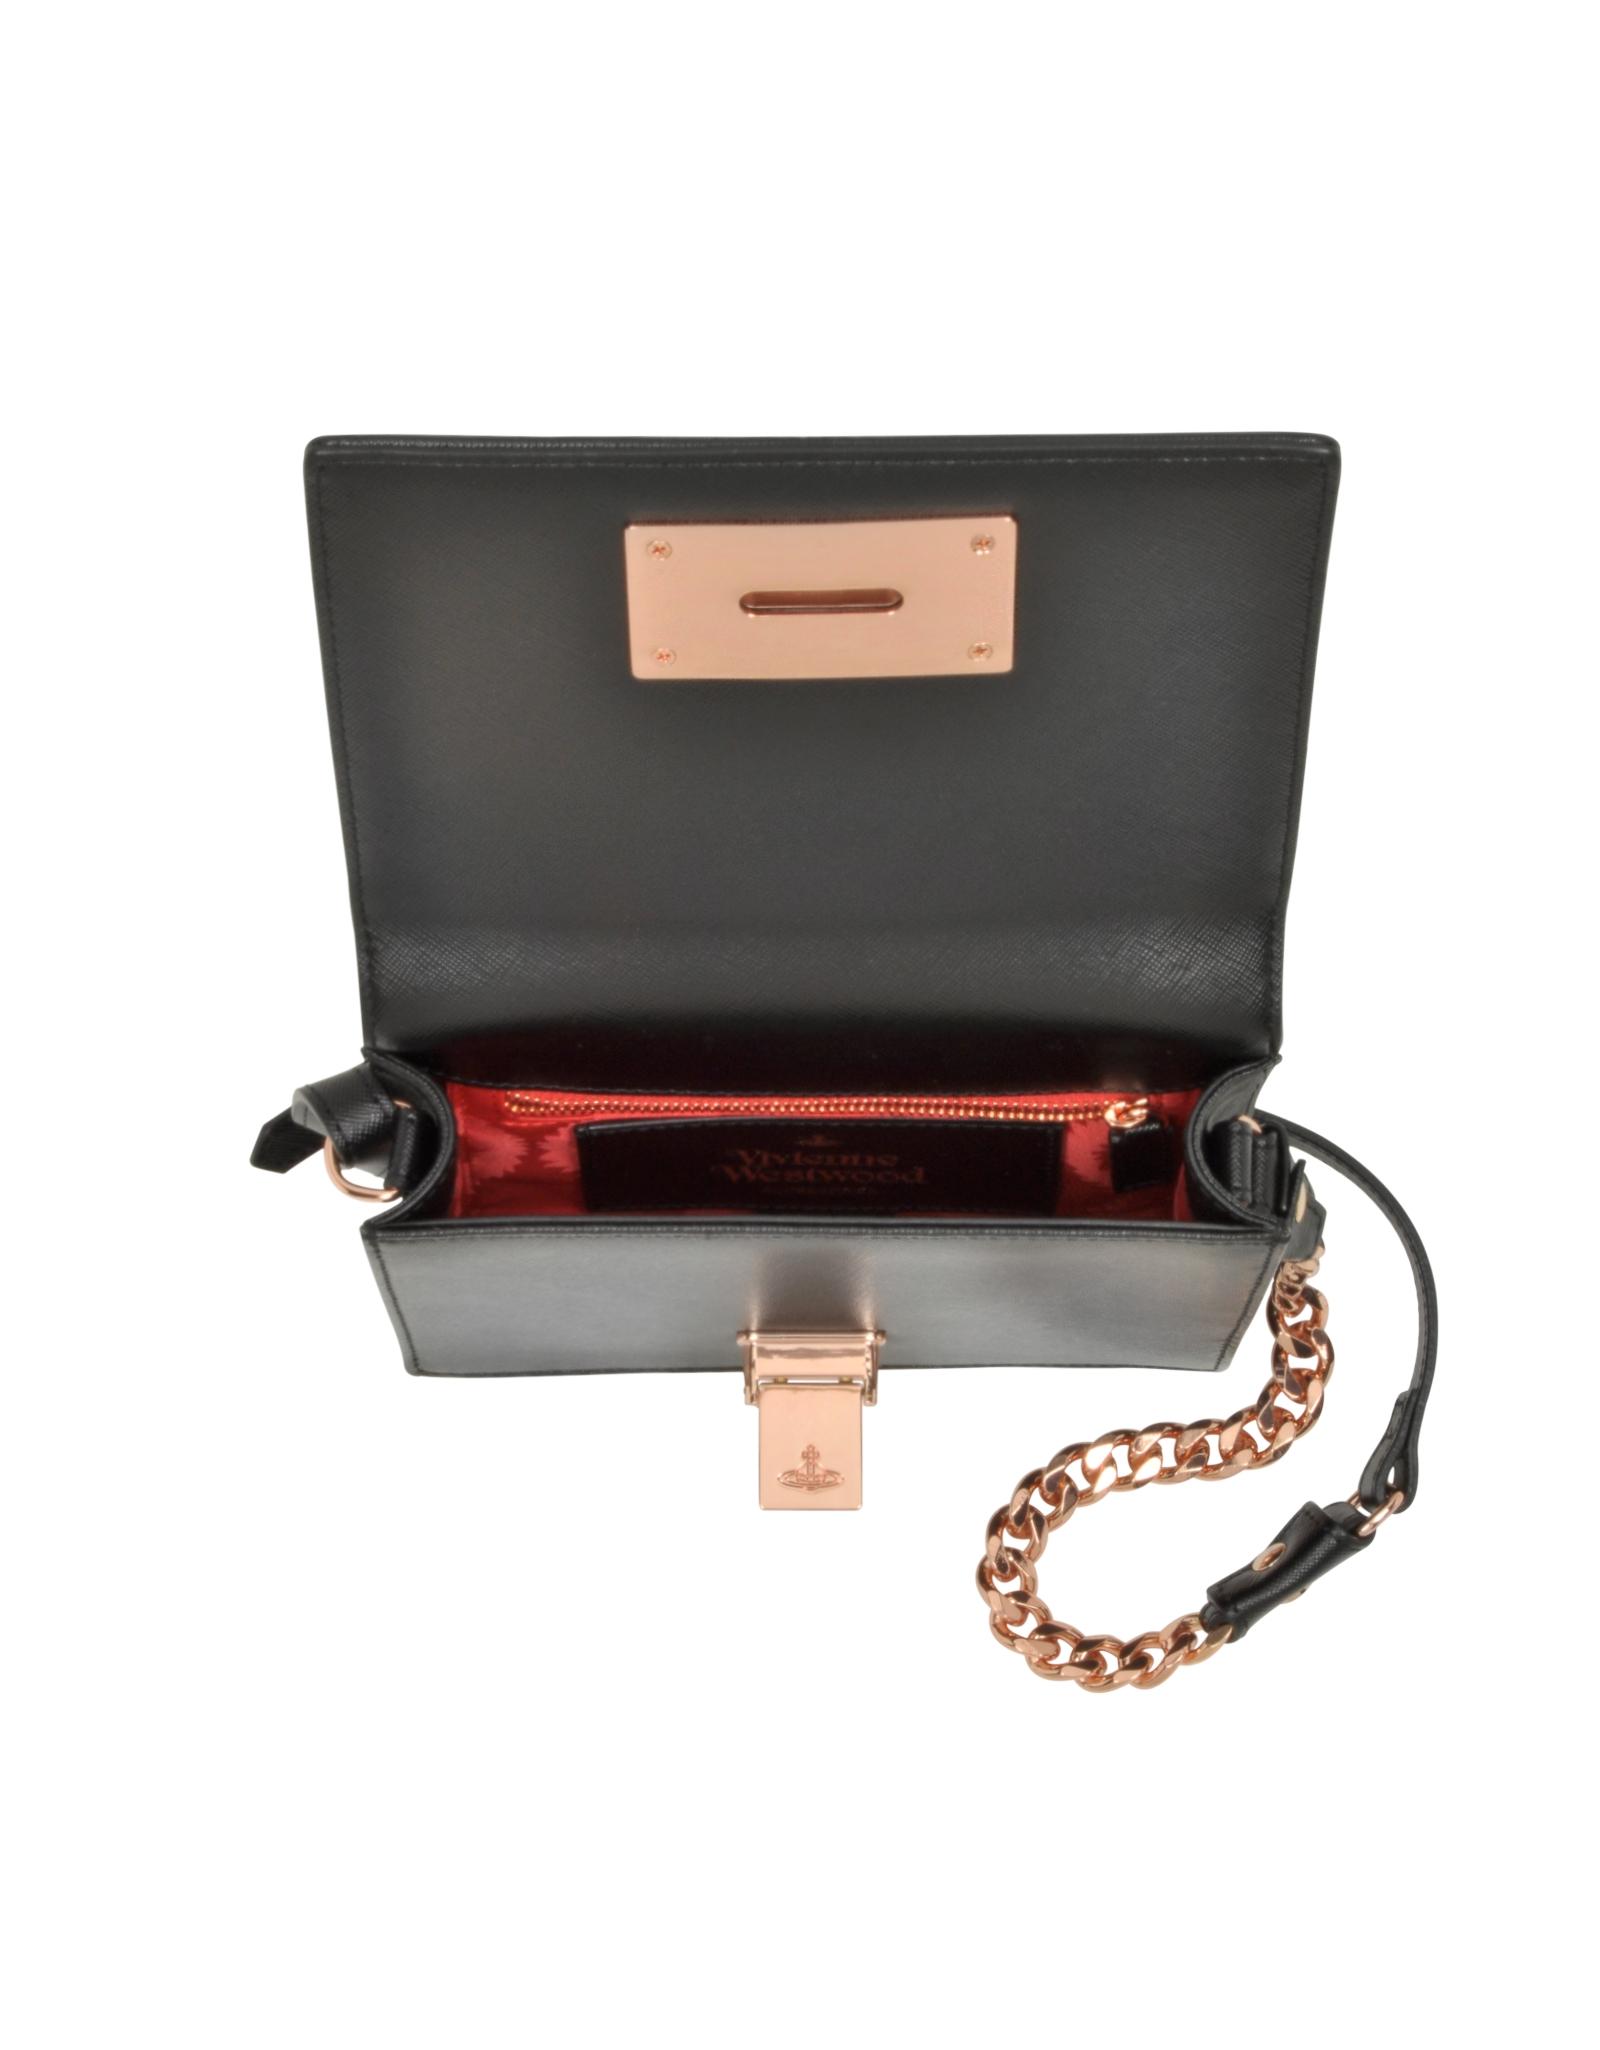 dfc9b5aaba Vivienne Westwood Black Opio Saffiano Small Crossbody Bag in Black ...